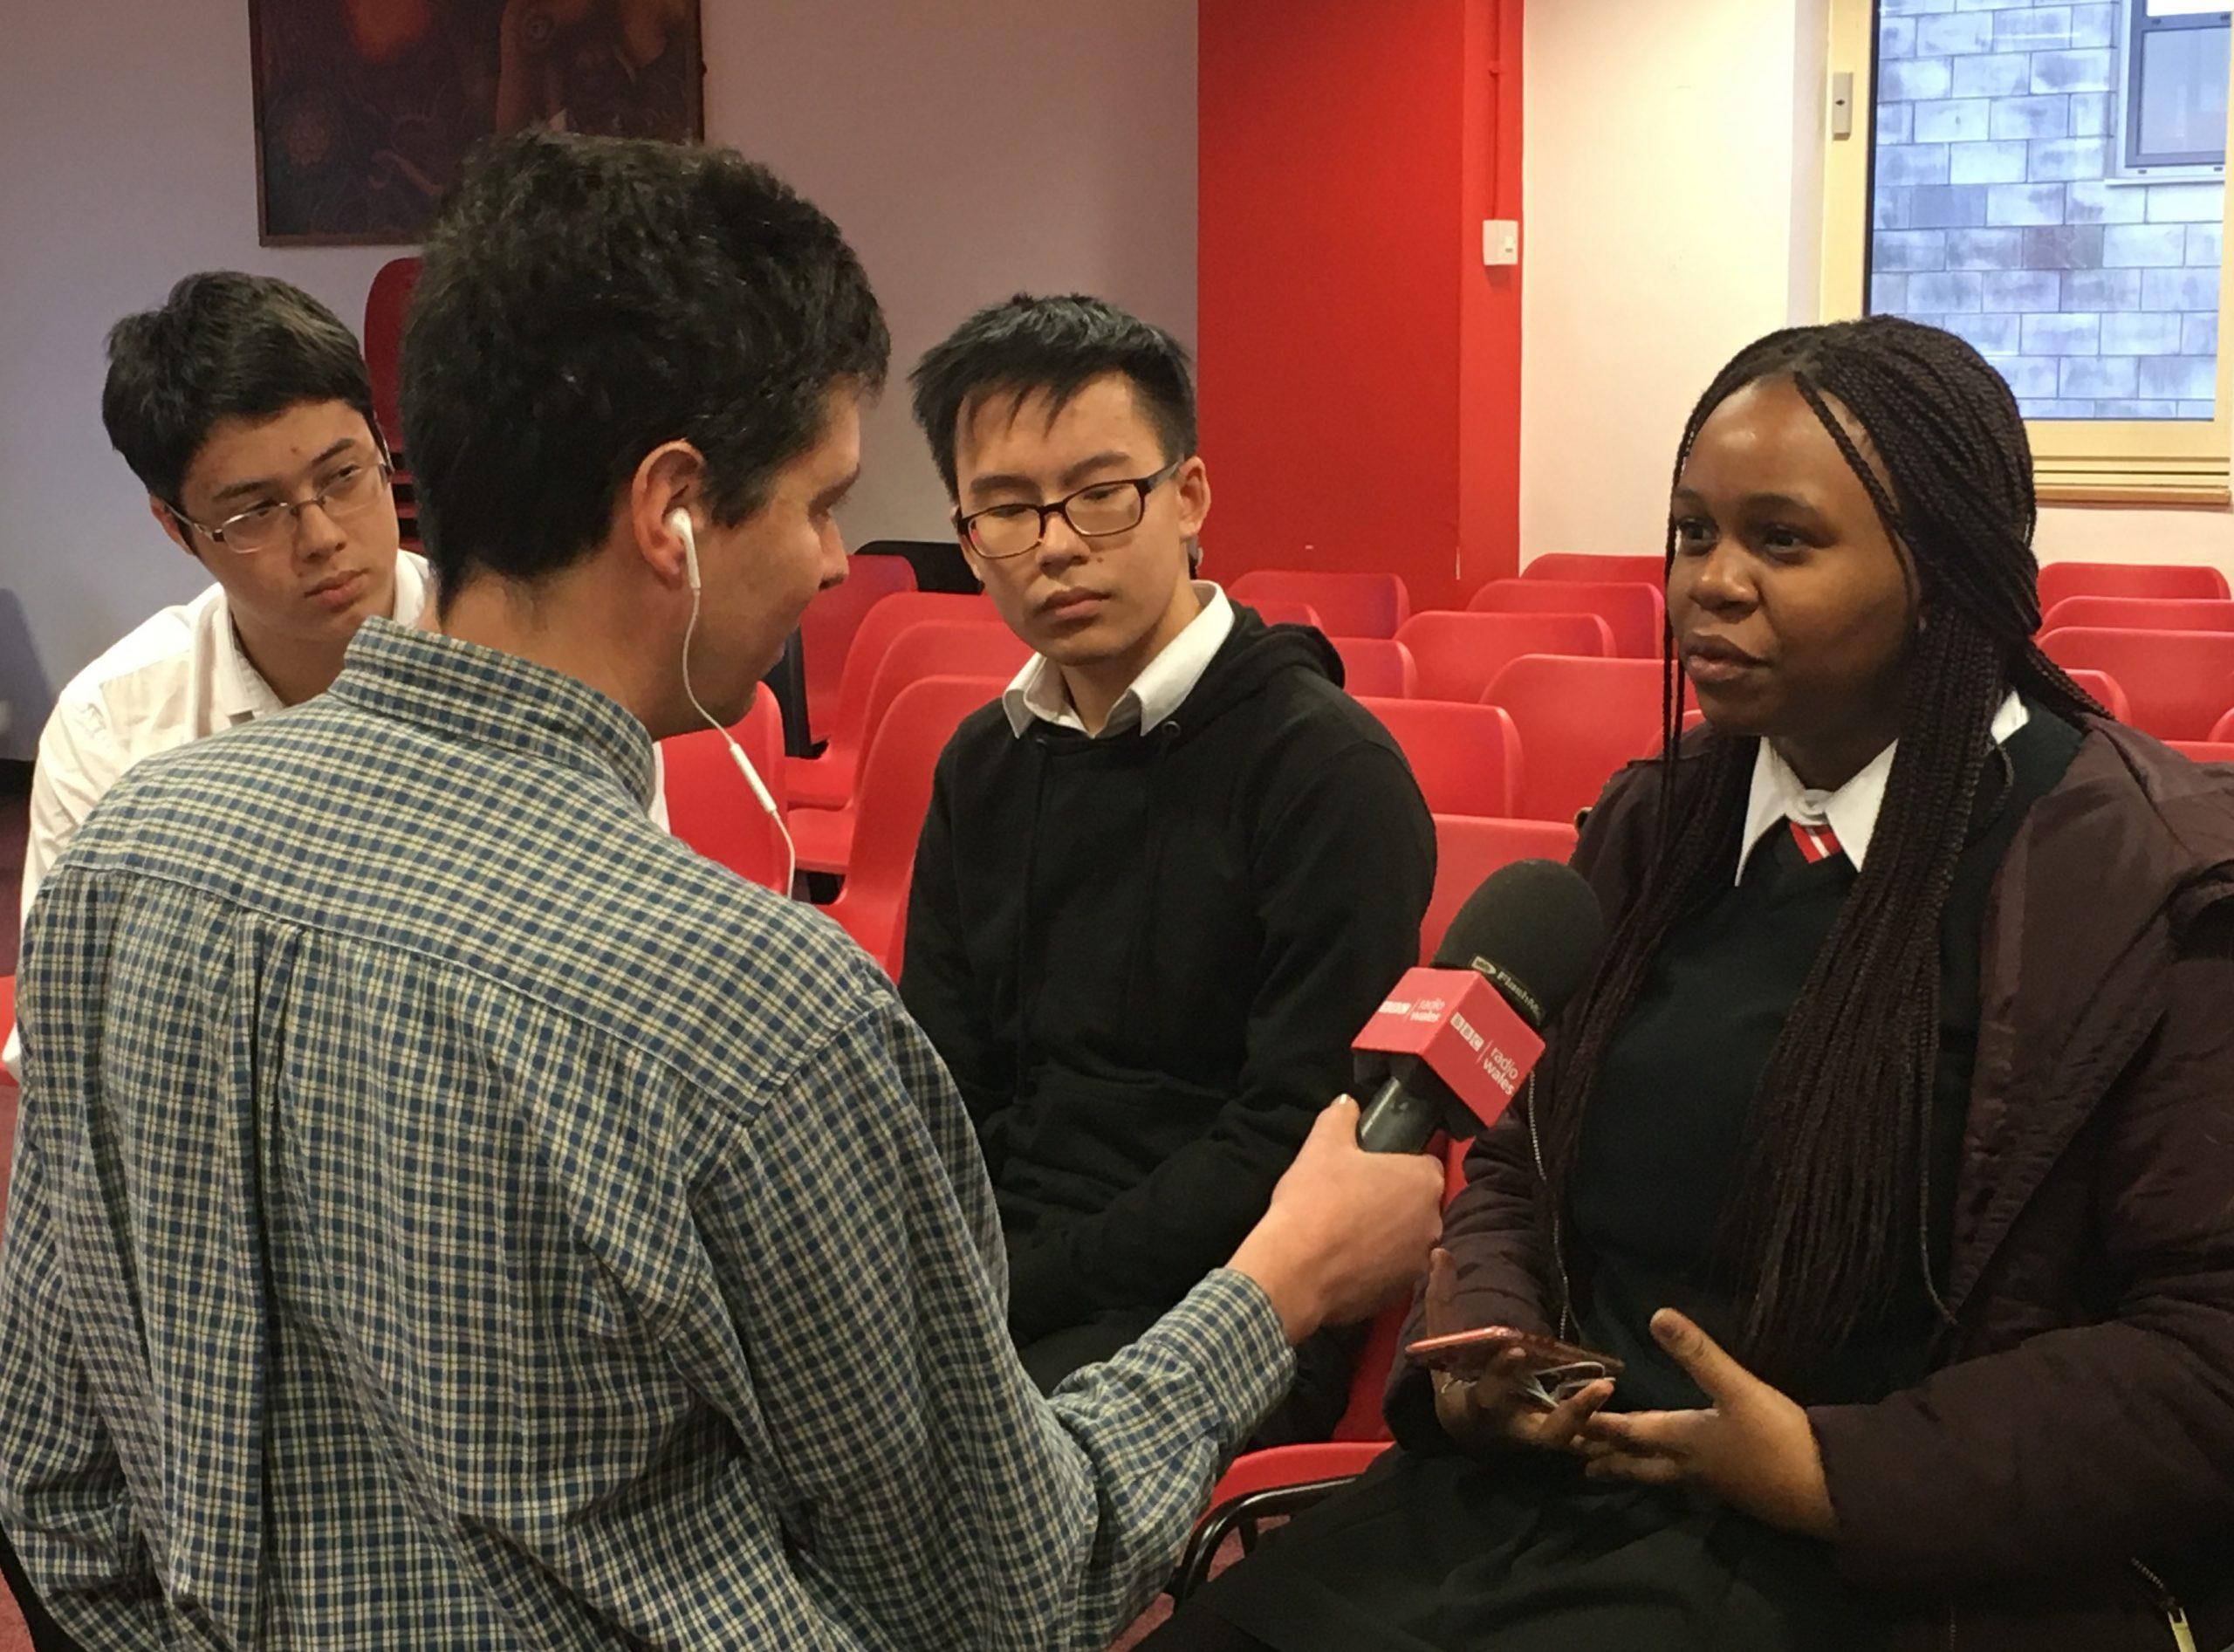 BBC Radio Wales interview Cardiff Sixth Form College students regarding UN Model Conference in Senedd, Cardiff Bay